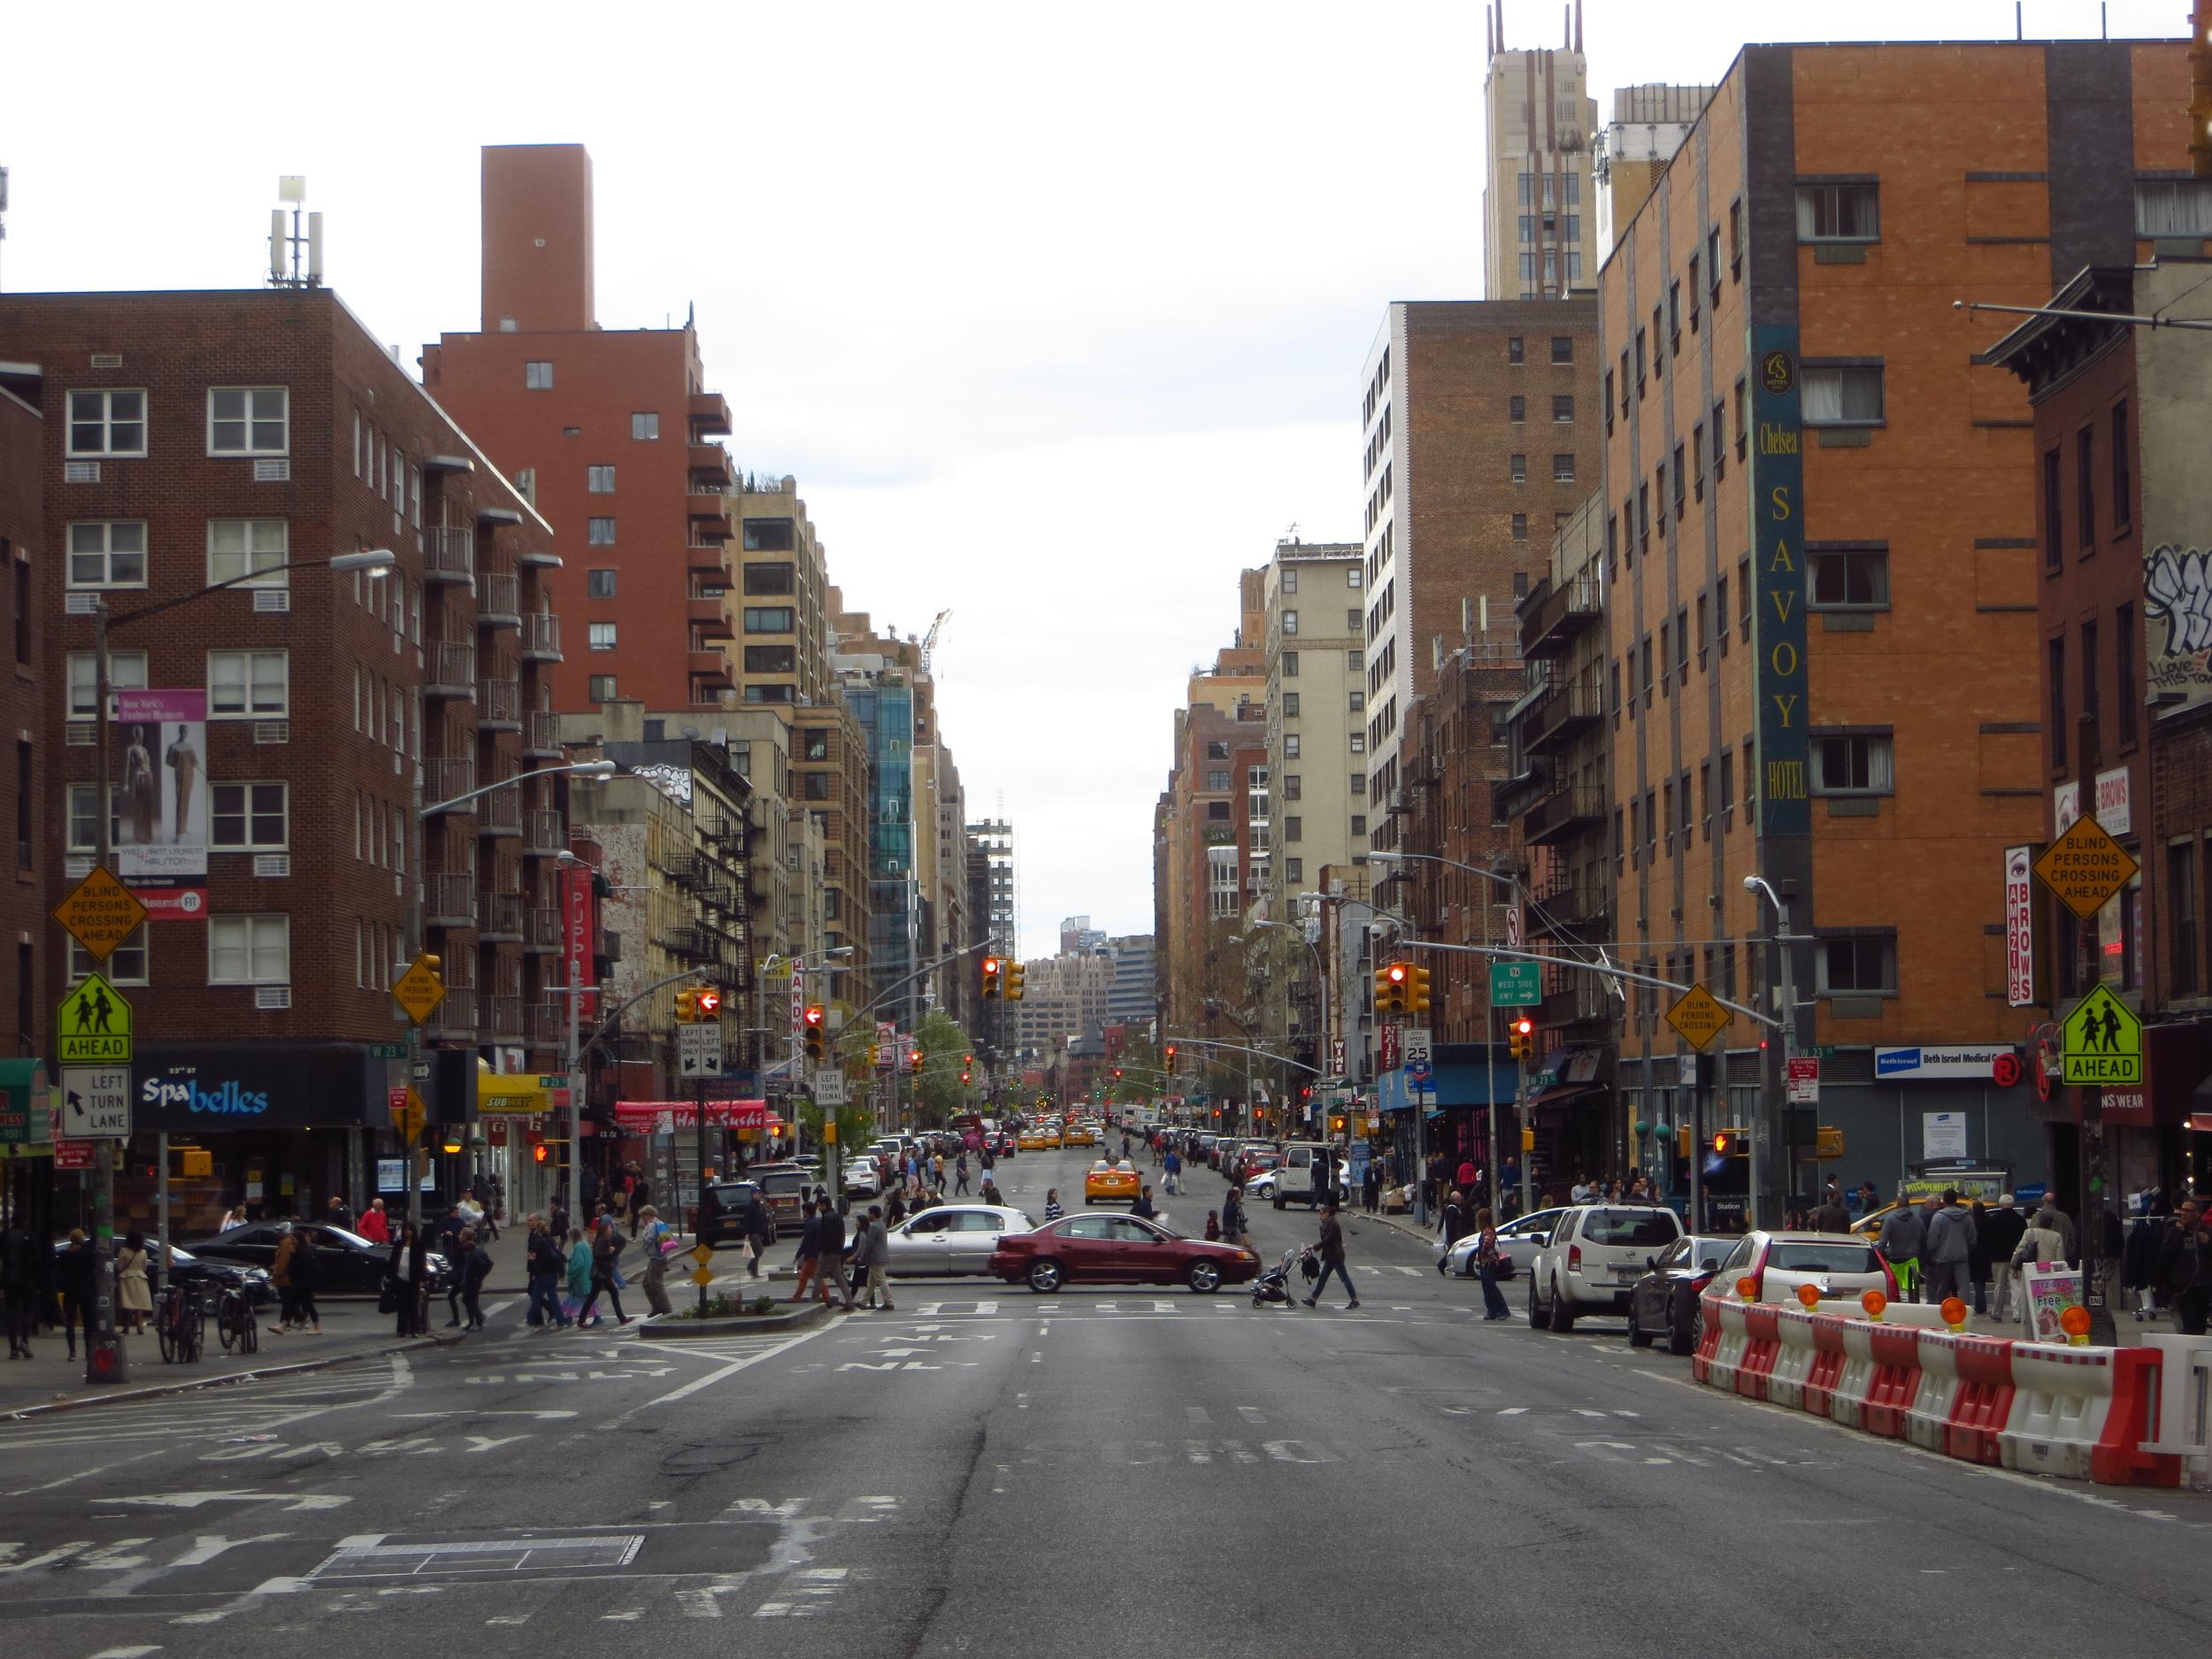 View down 7th Avenue